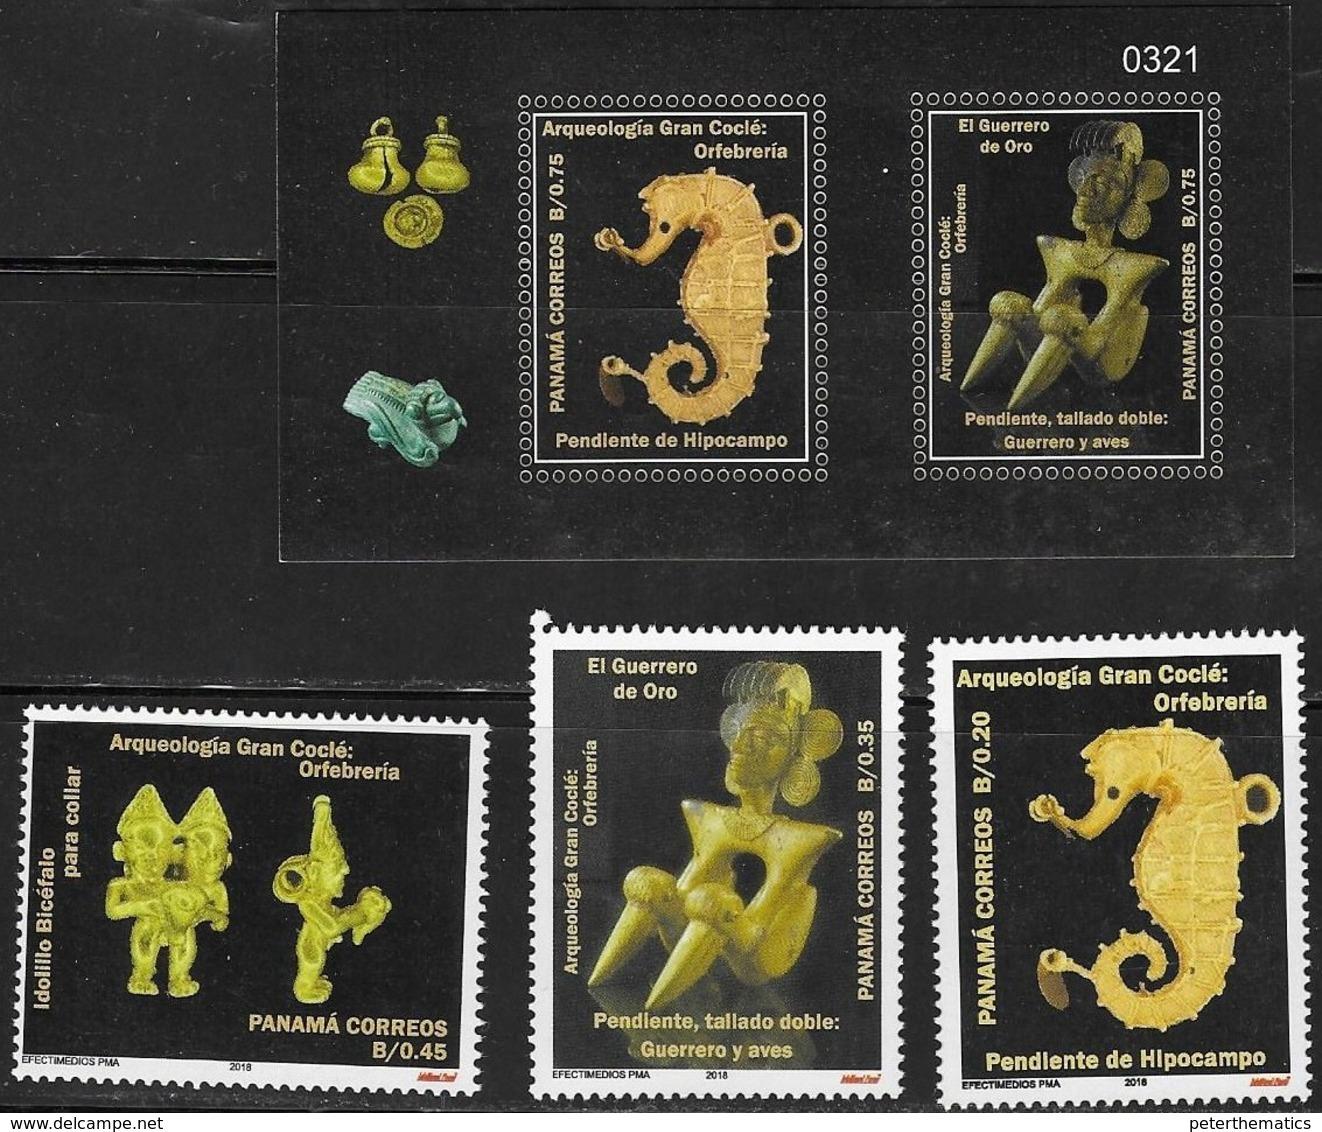 PANAMA, 2018, MNH,ARCHAEOLOGY, GOLD ARTIFACTS, SEAHORSES, WARRIORS, BIRDS, 3v+SHEETLET - Archéologie